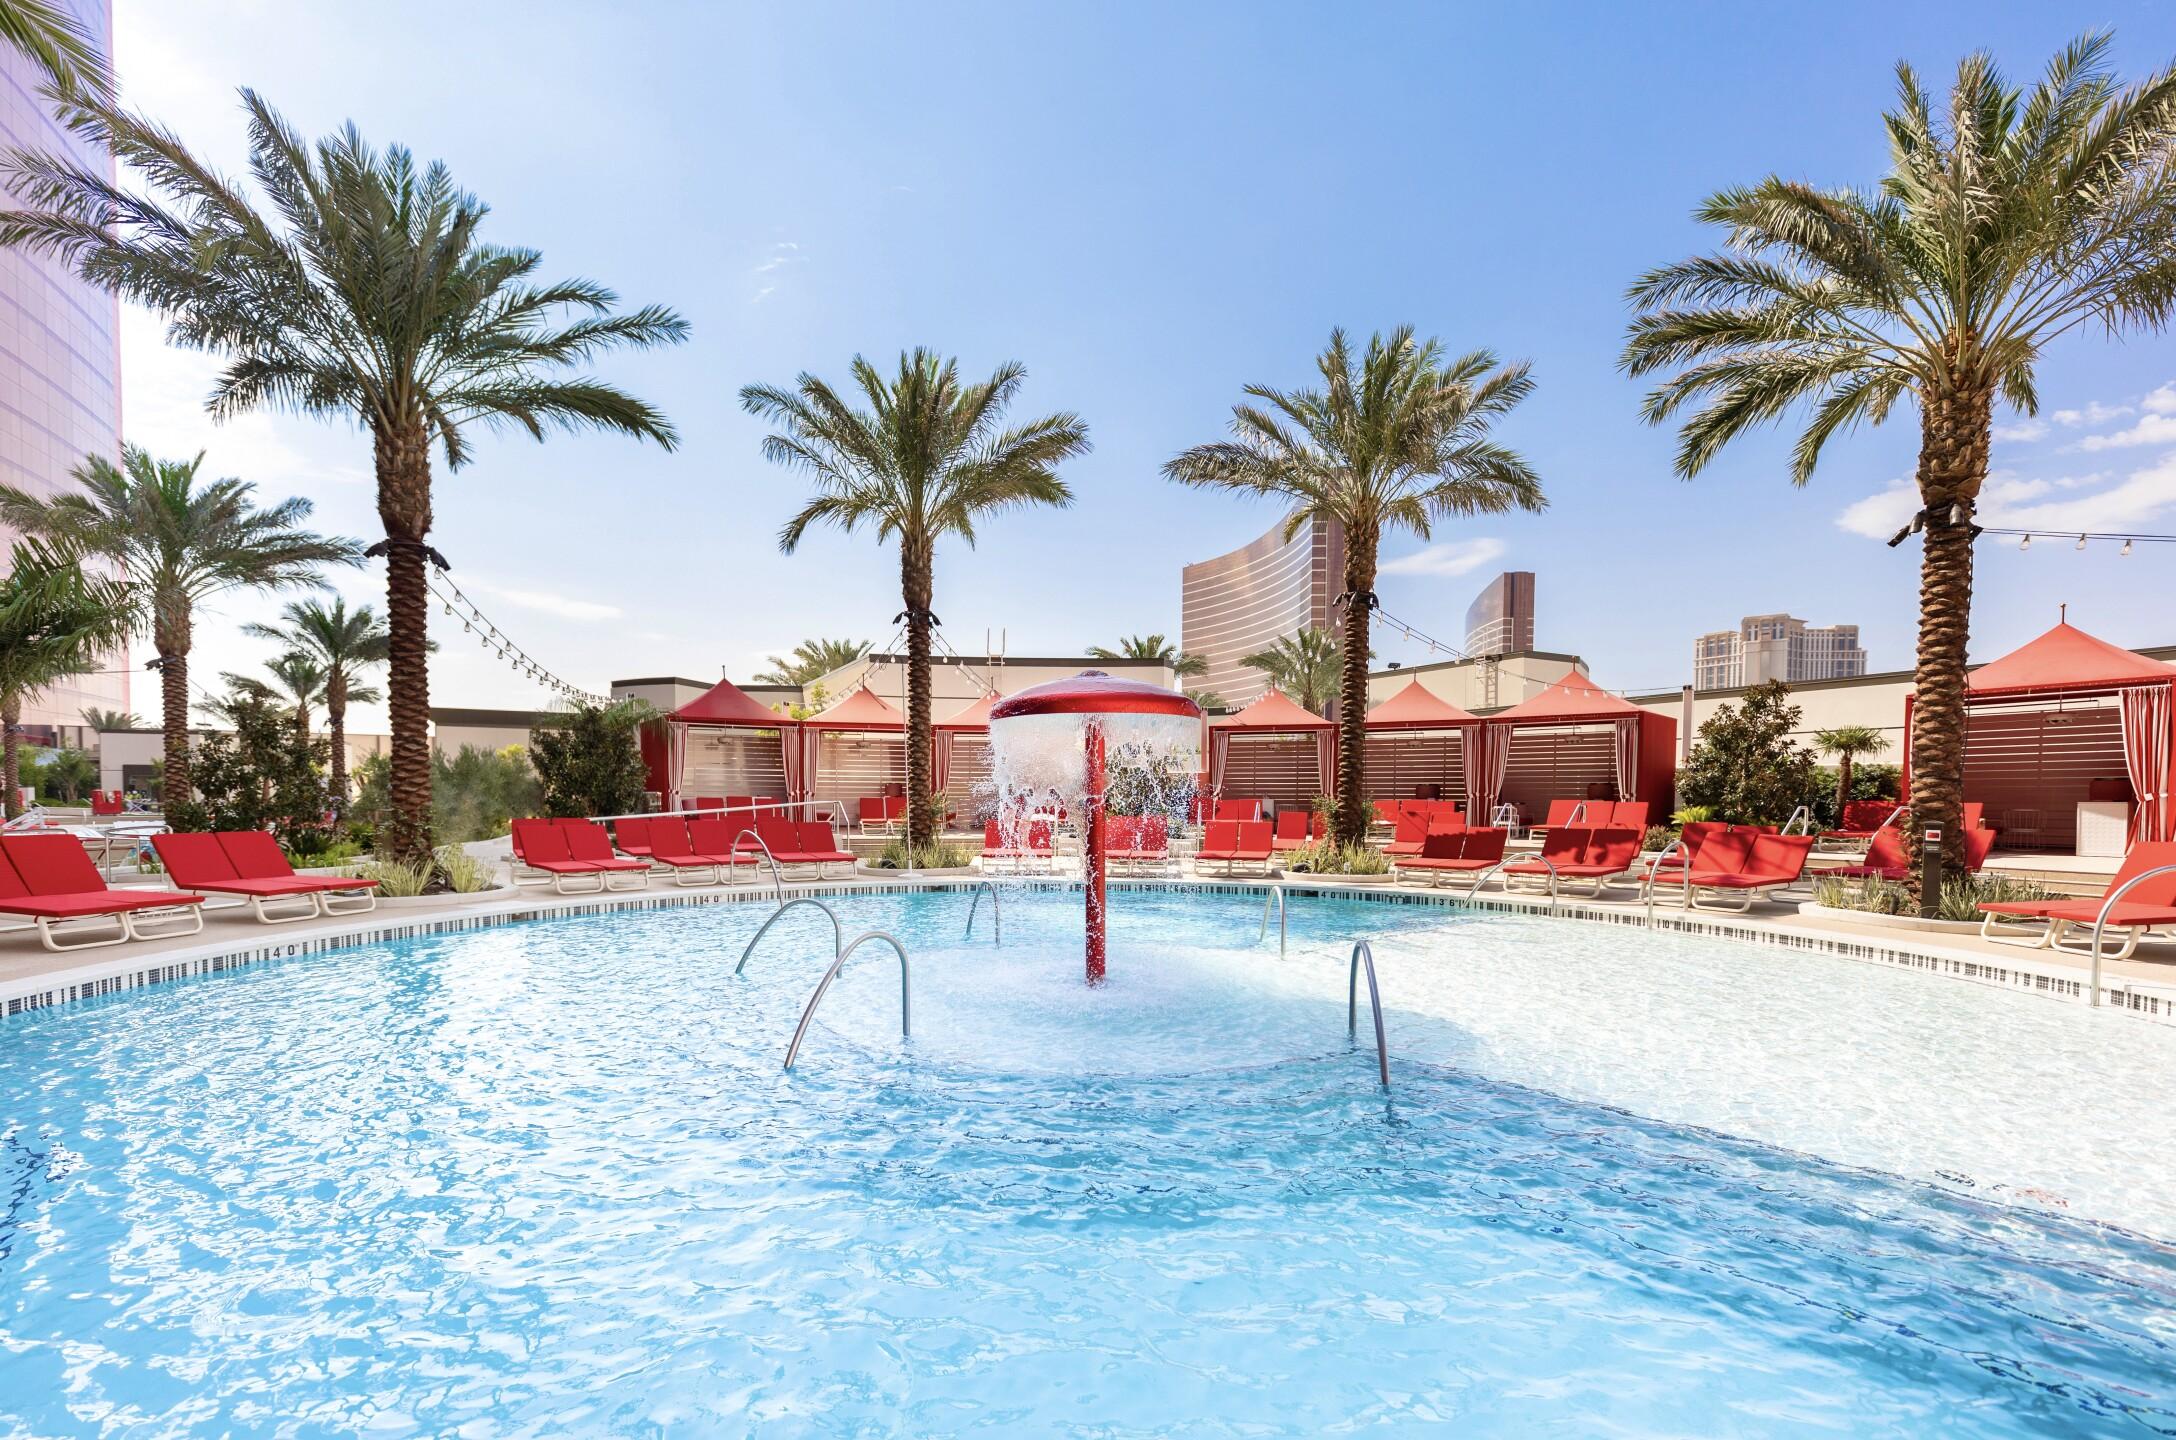 Resorts World Las Vegas - Cabana Pool 2- Credit Megan Blair.jpg